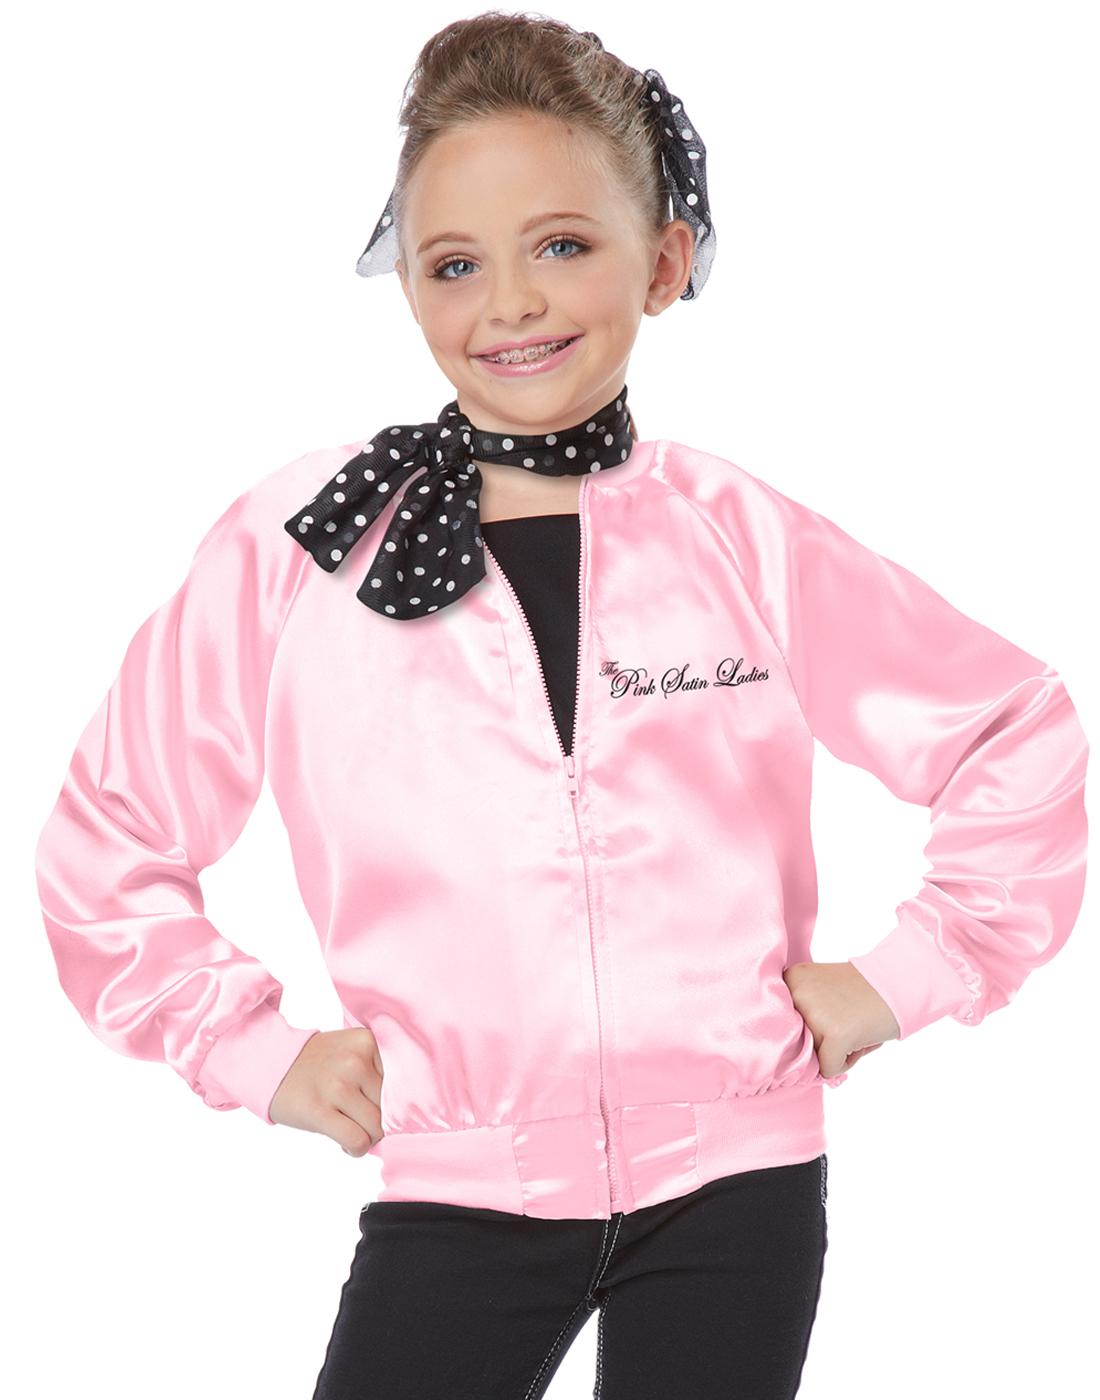 grease the pink ladies satin jacket tbird 50u0027s child halloween grease the pink ladies satin jacket t bird 50u0027s child halloween